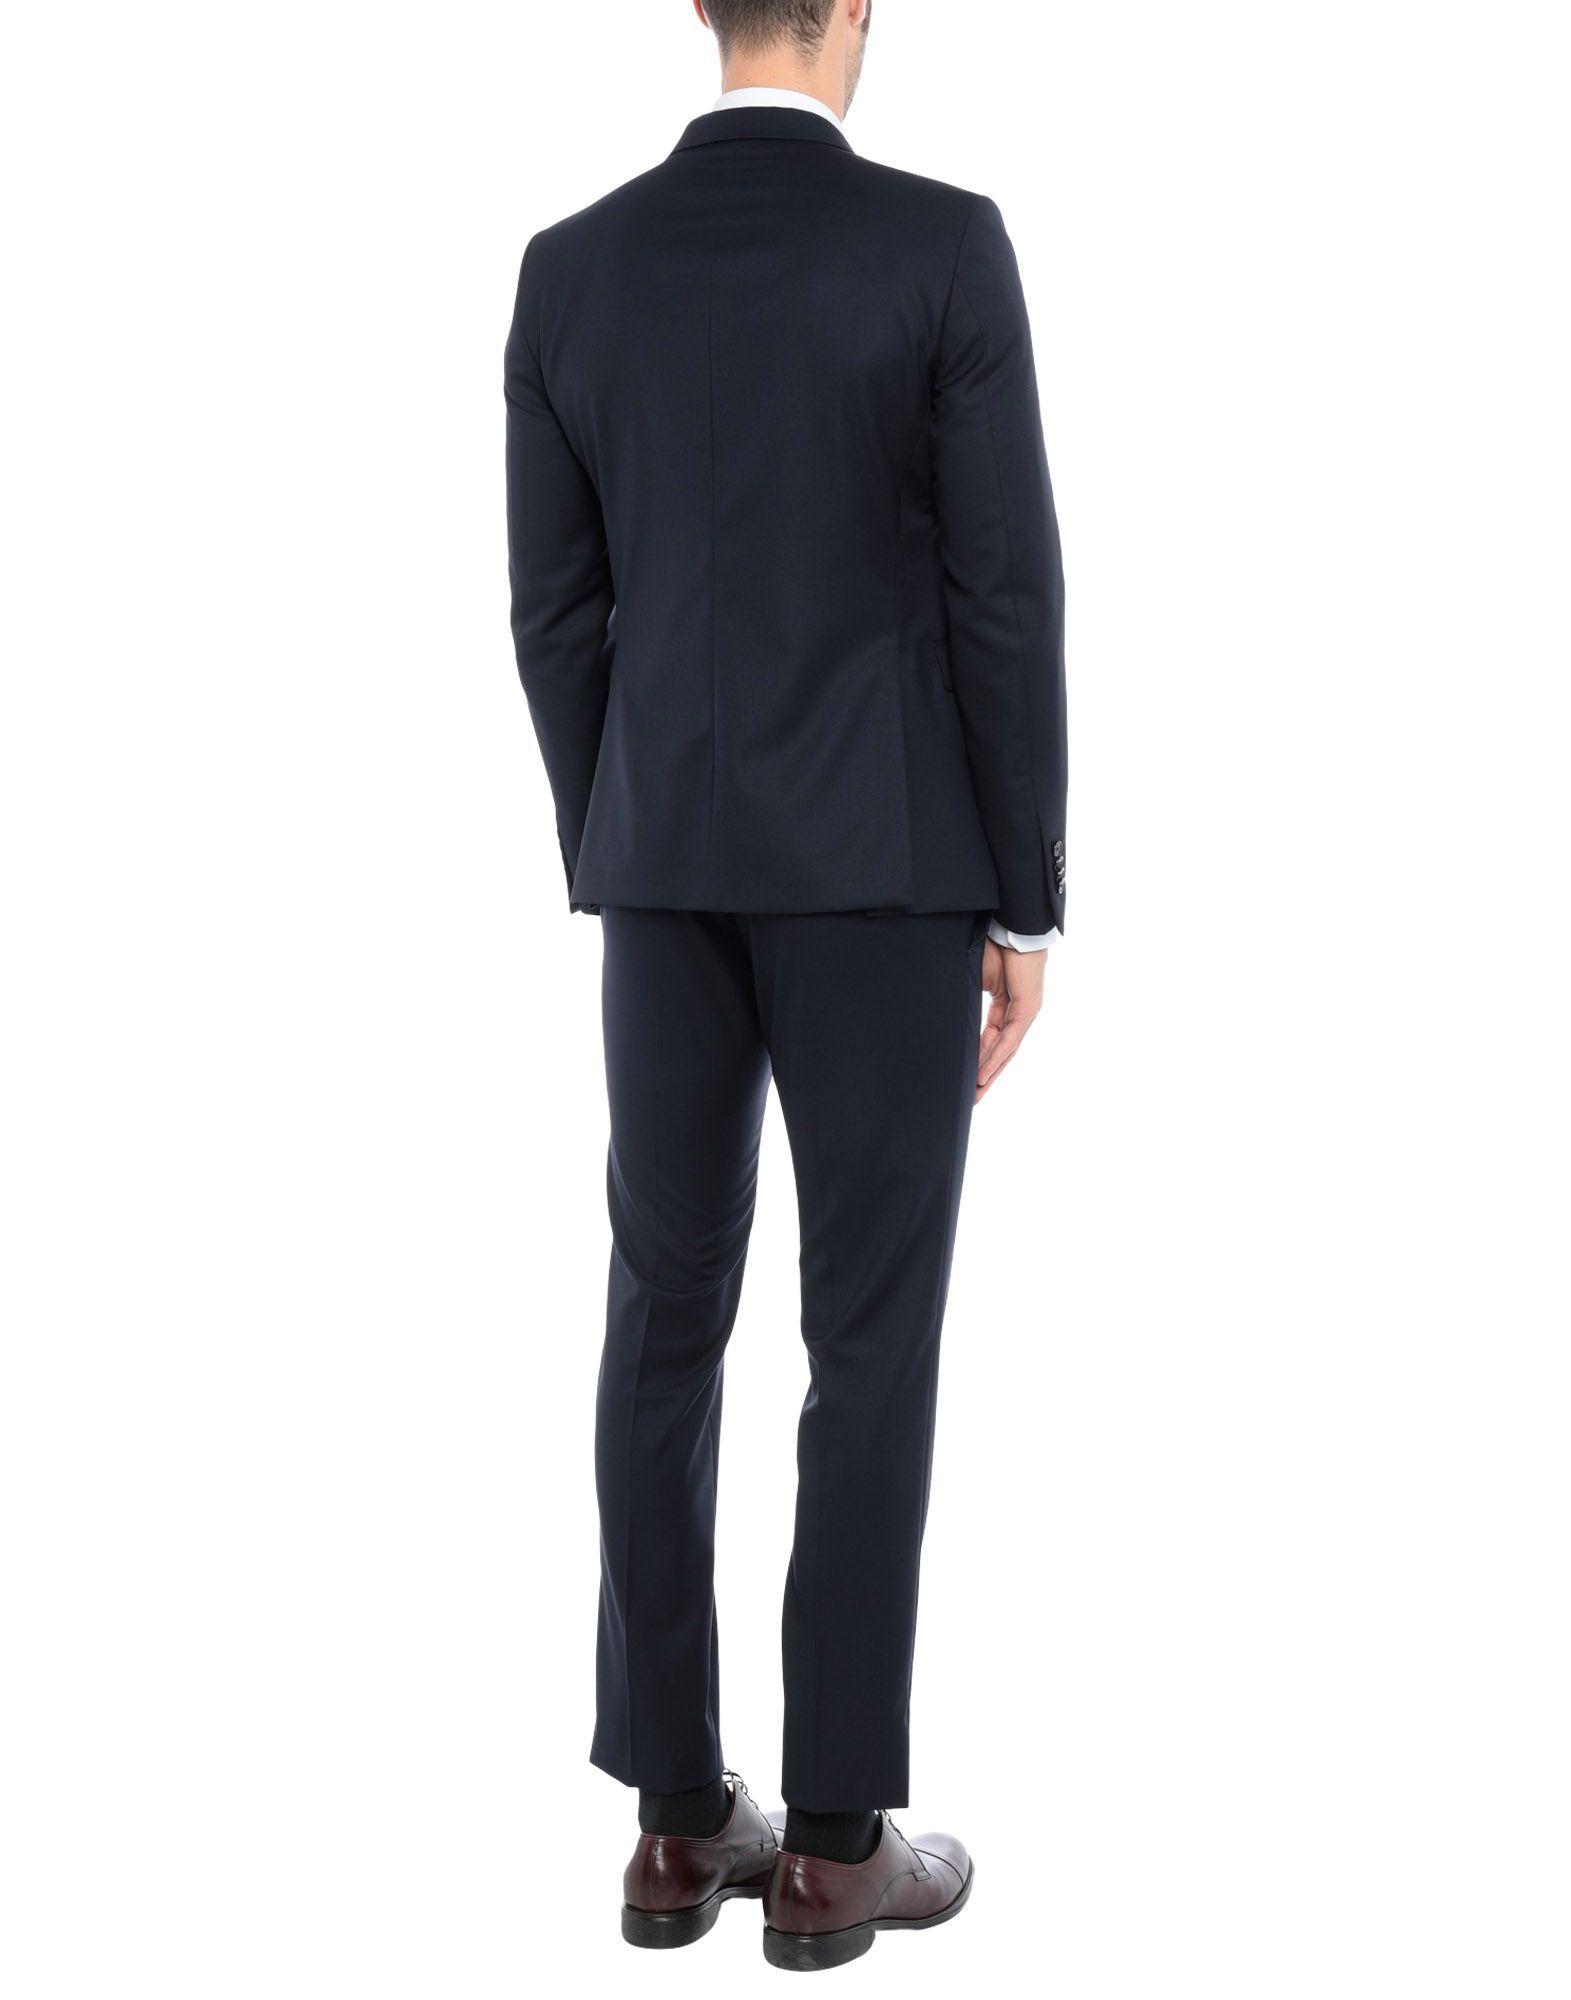 Tagliatore Dark Blue Wool Single Breasted Suit